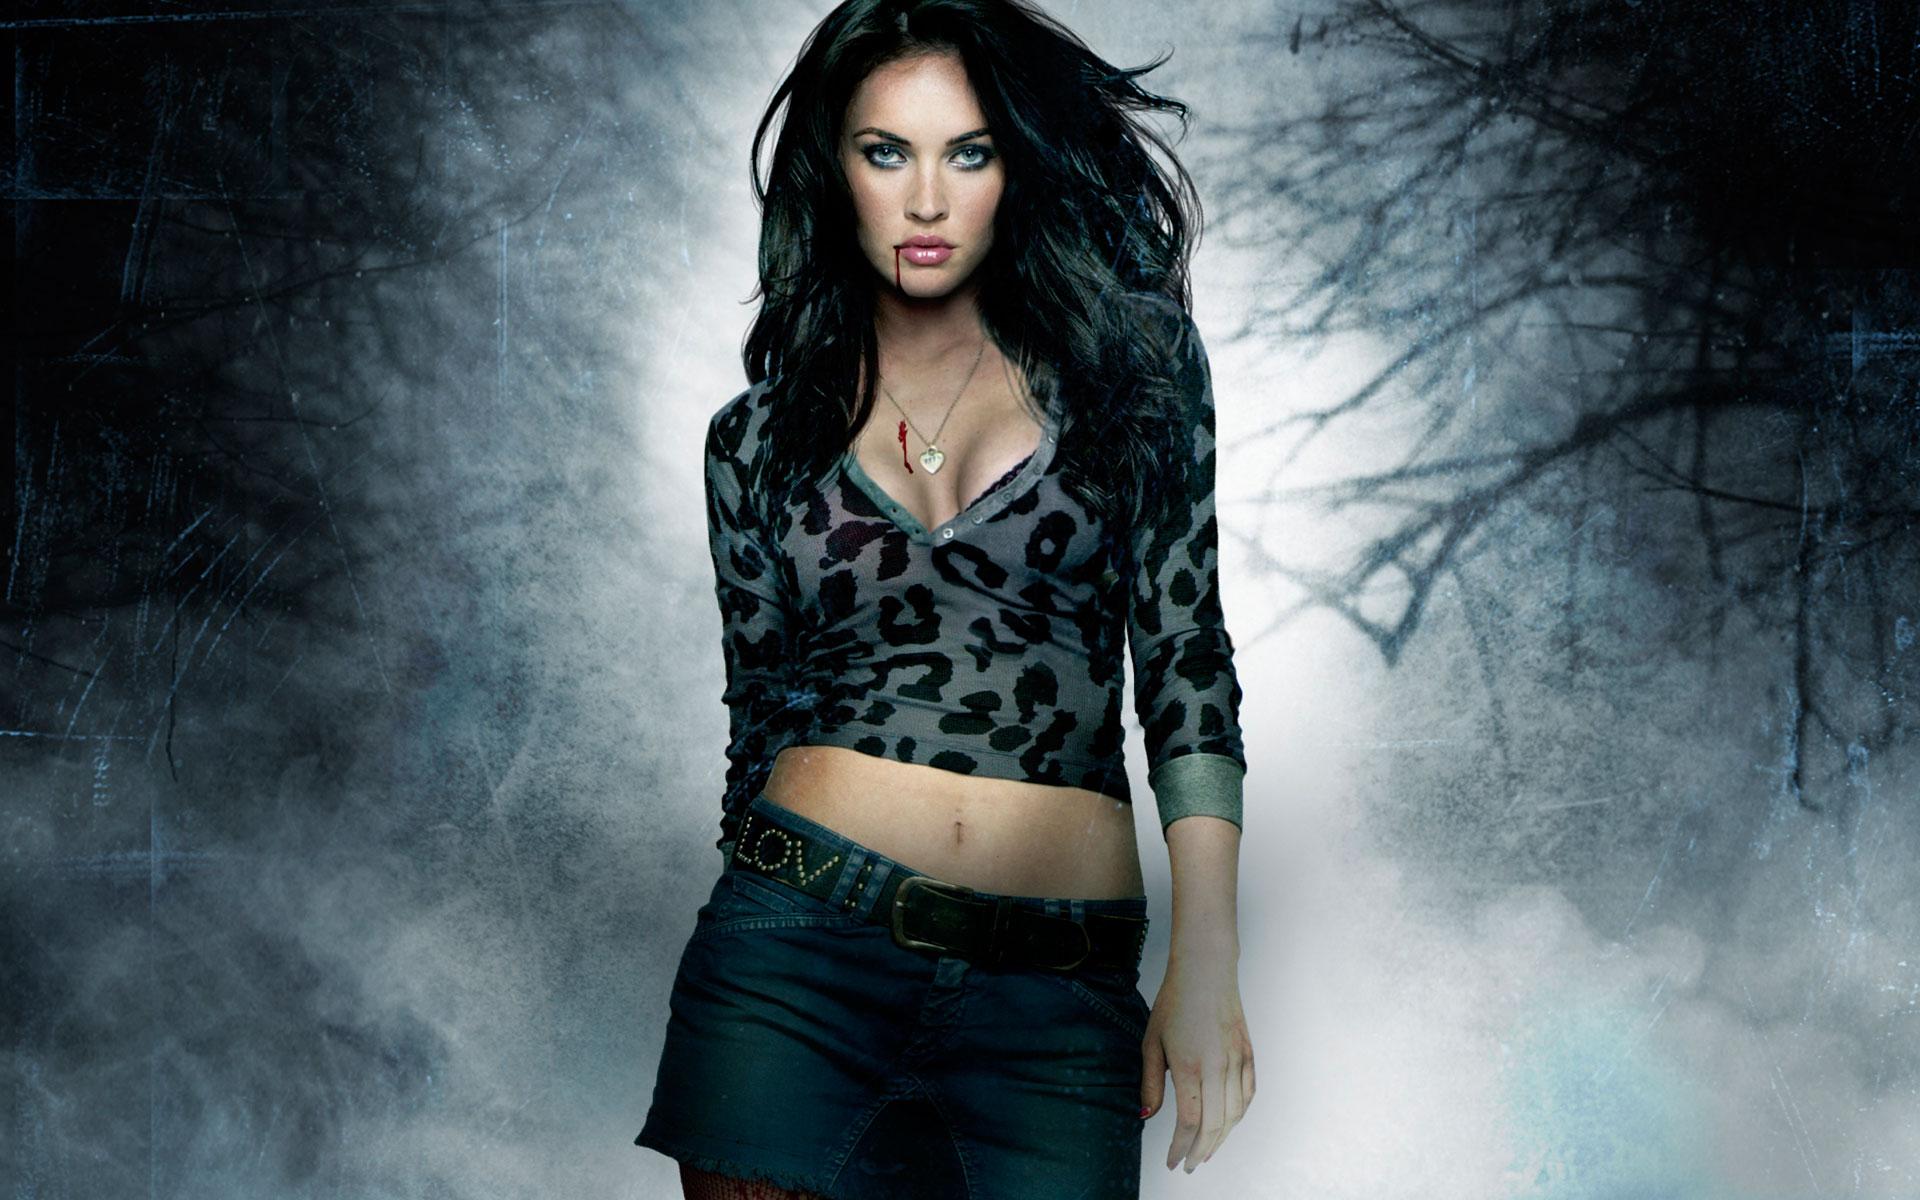 Megan Fox in Jennifers Body Poster wallpaper